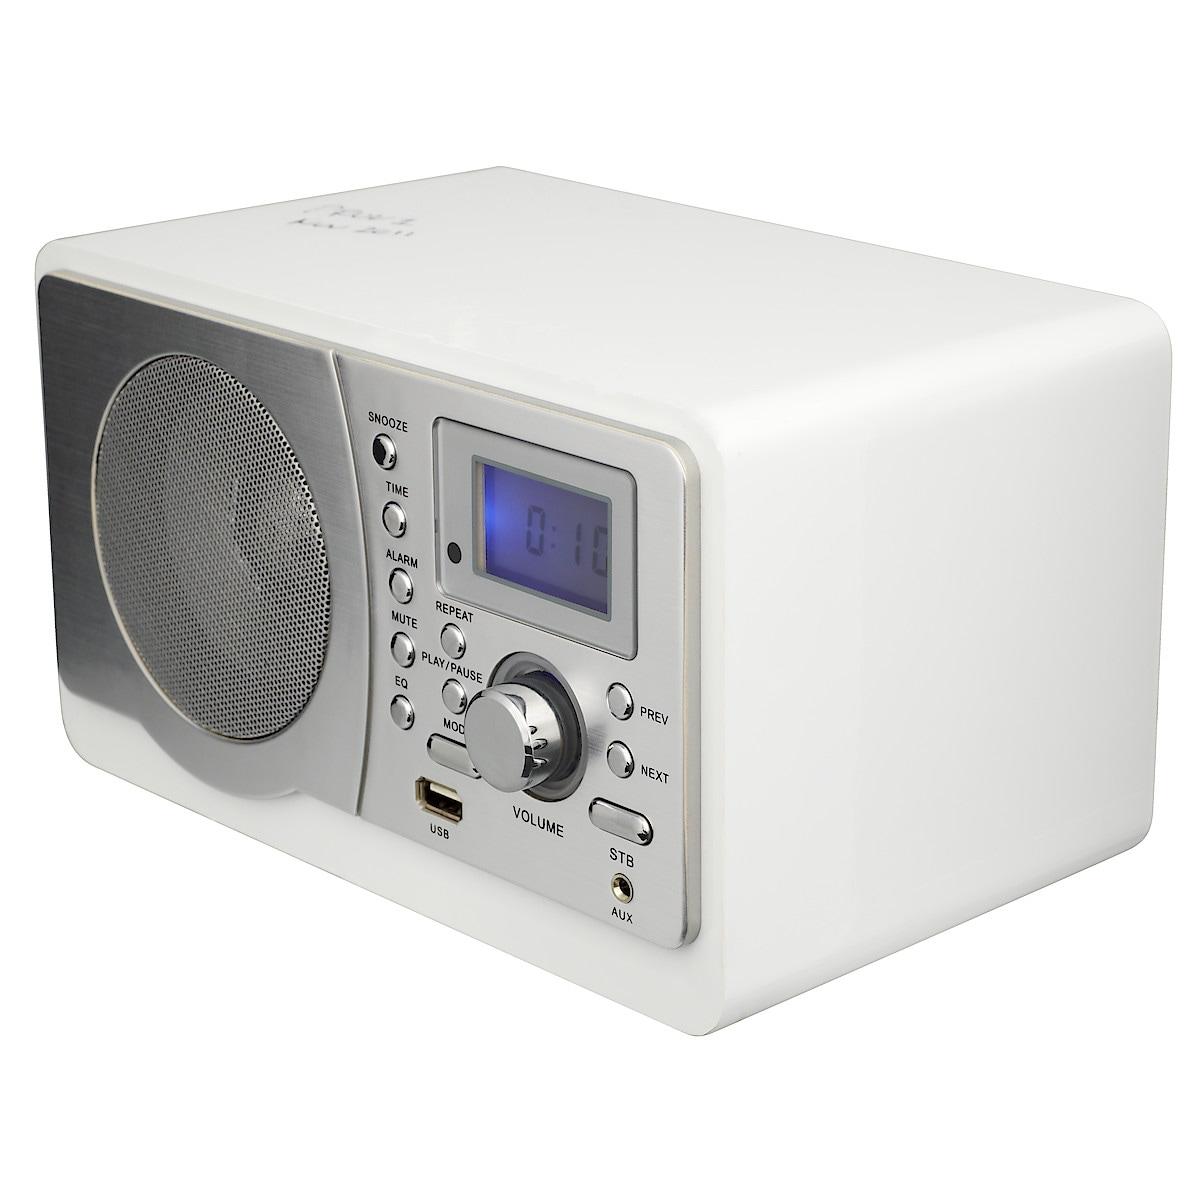 FM-radio med USB-anslutning